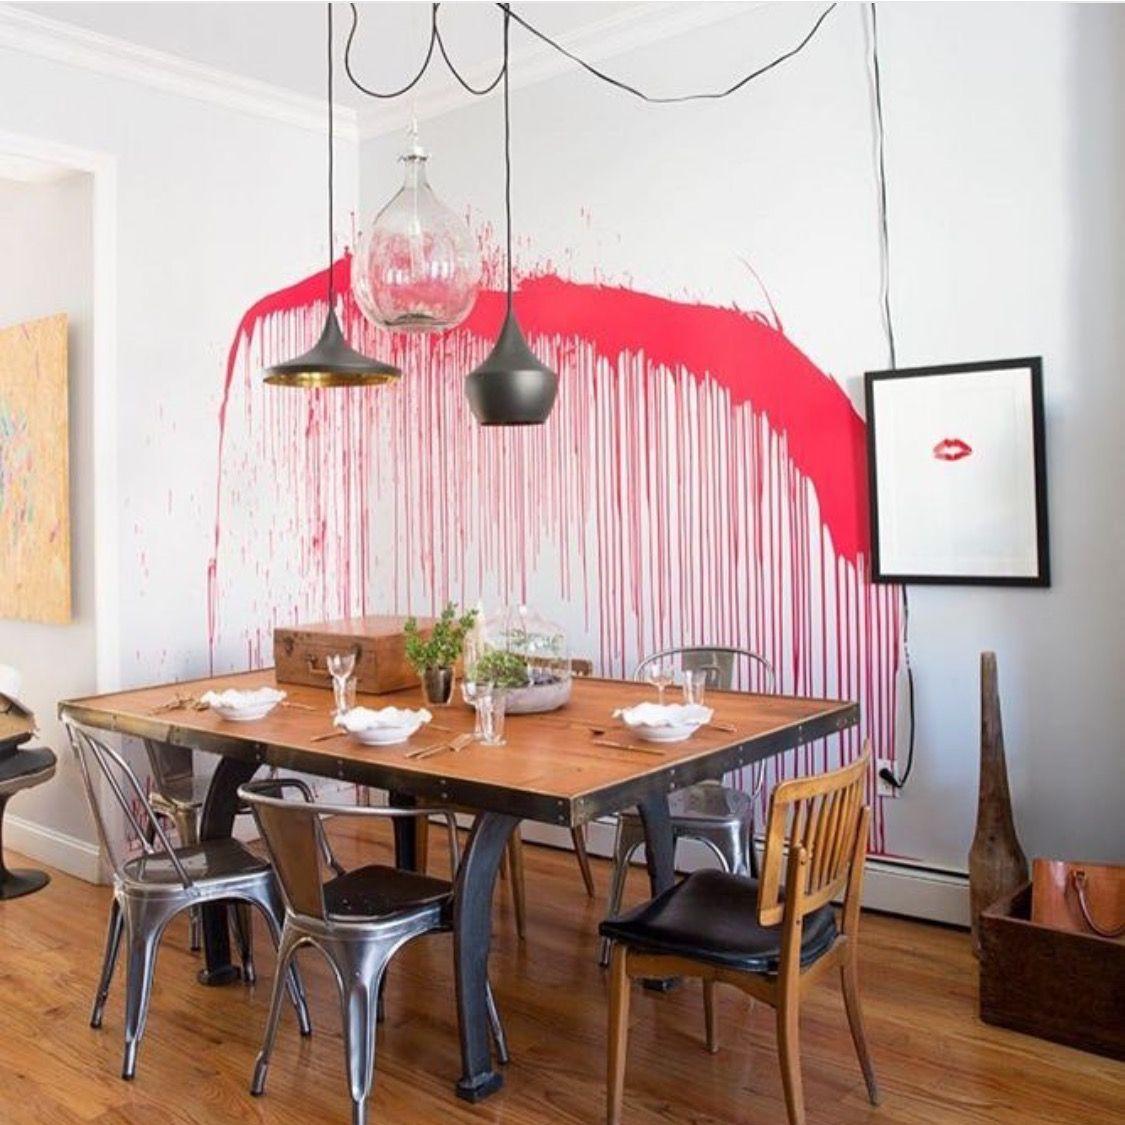 Explore Paint Ideas Mood Board Interior and